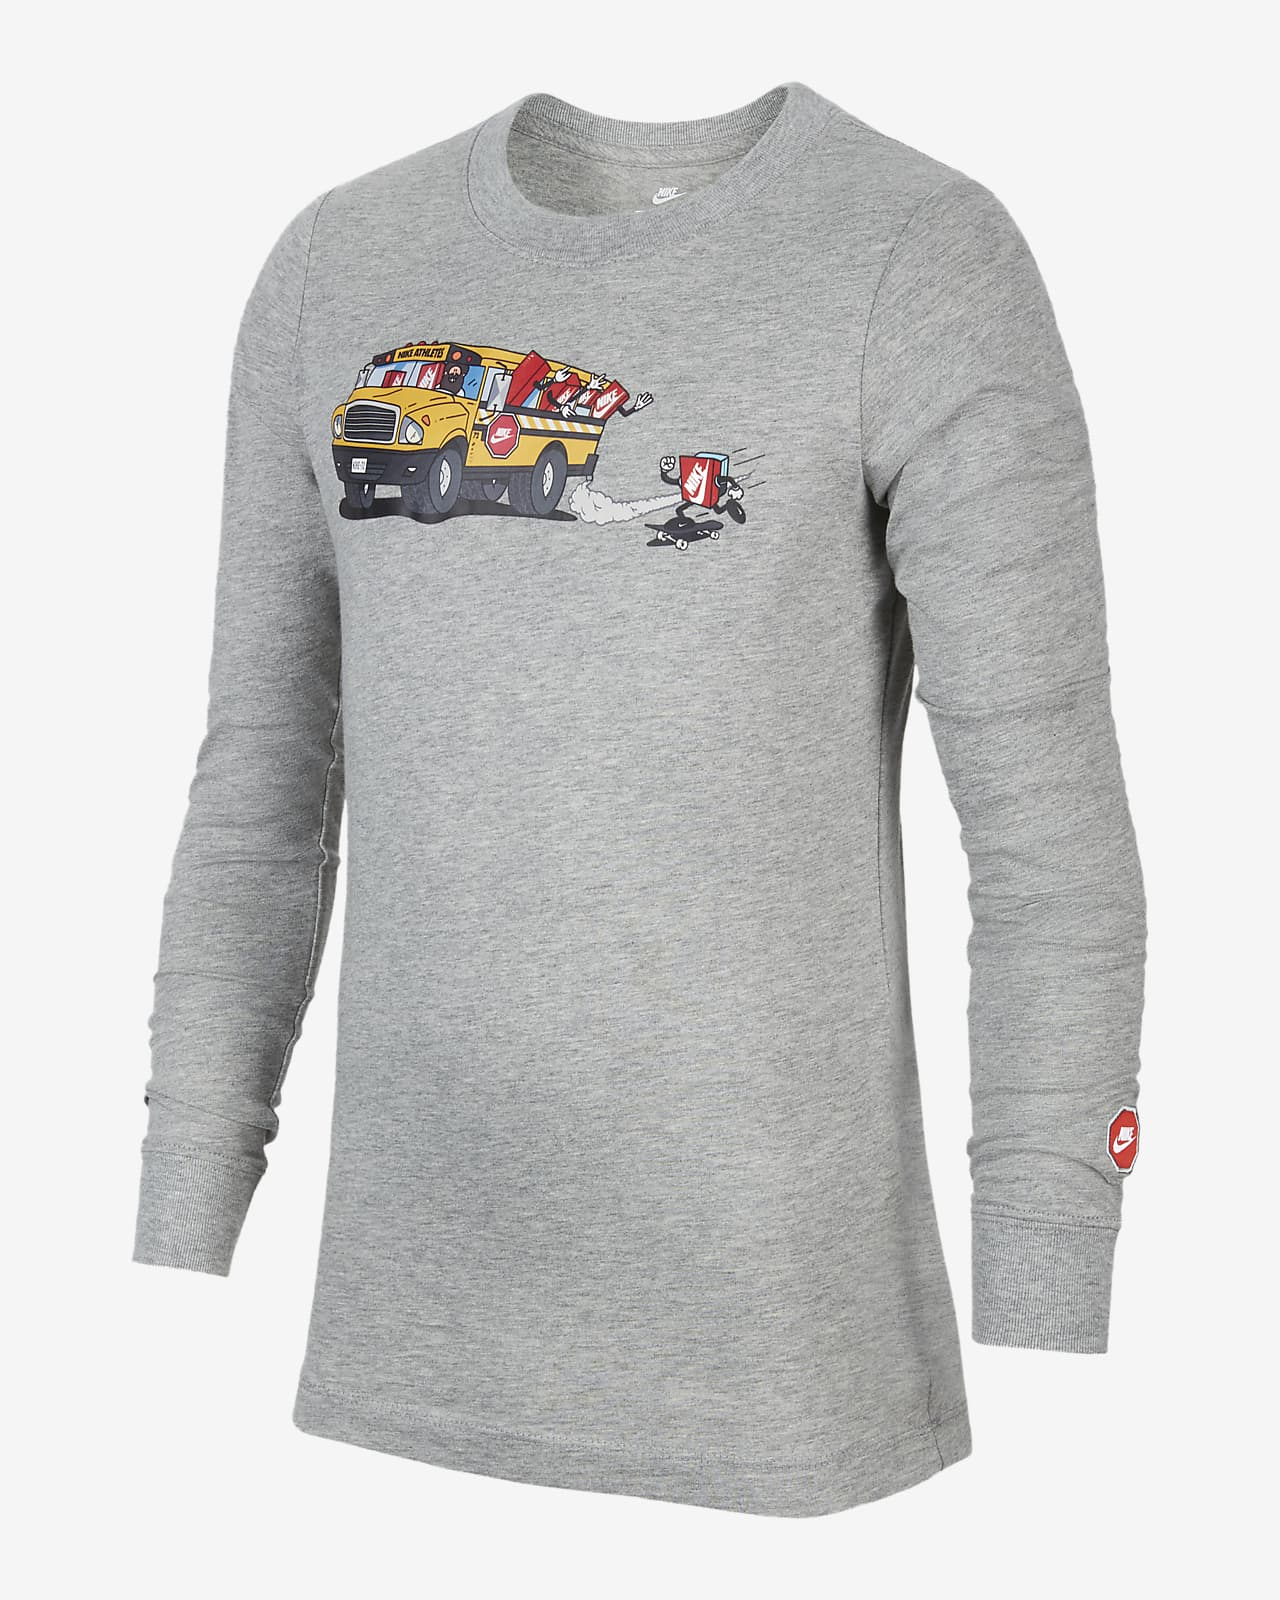 Playera de manga larga para niños grandes Nike Sportswear